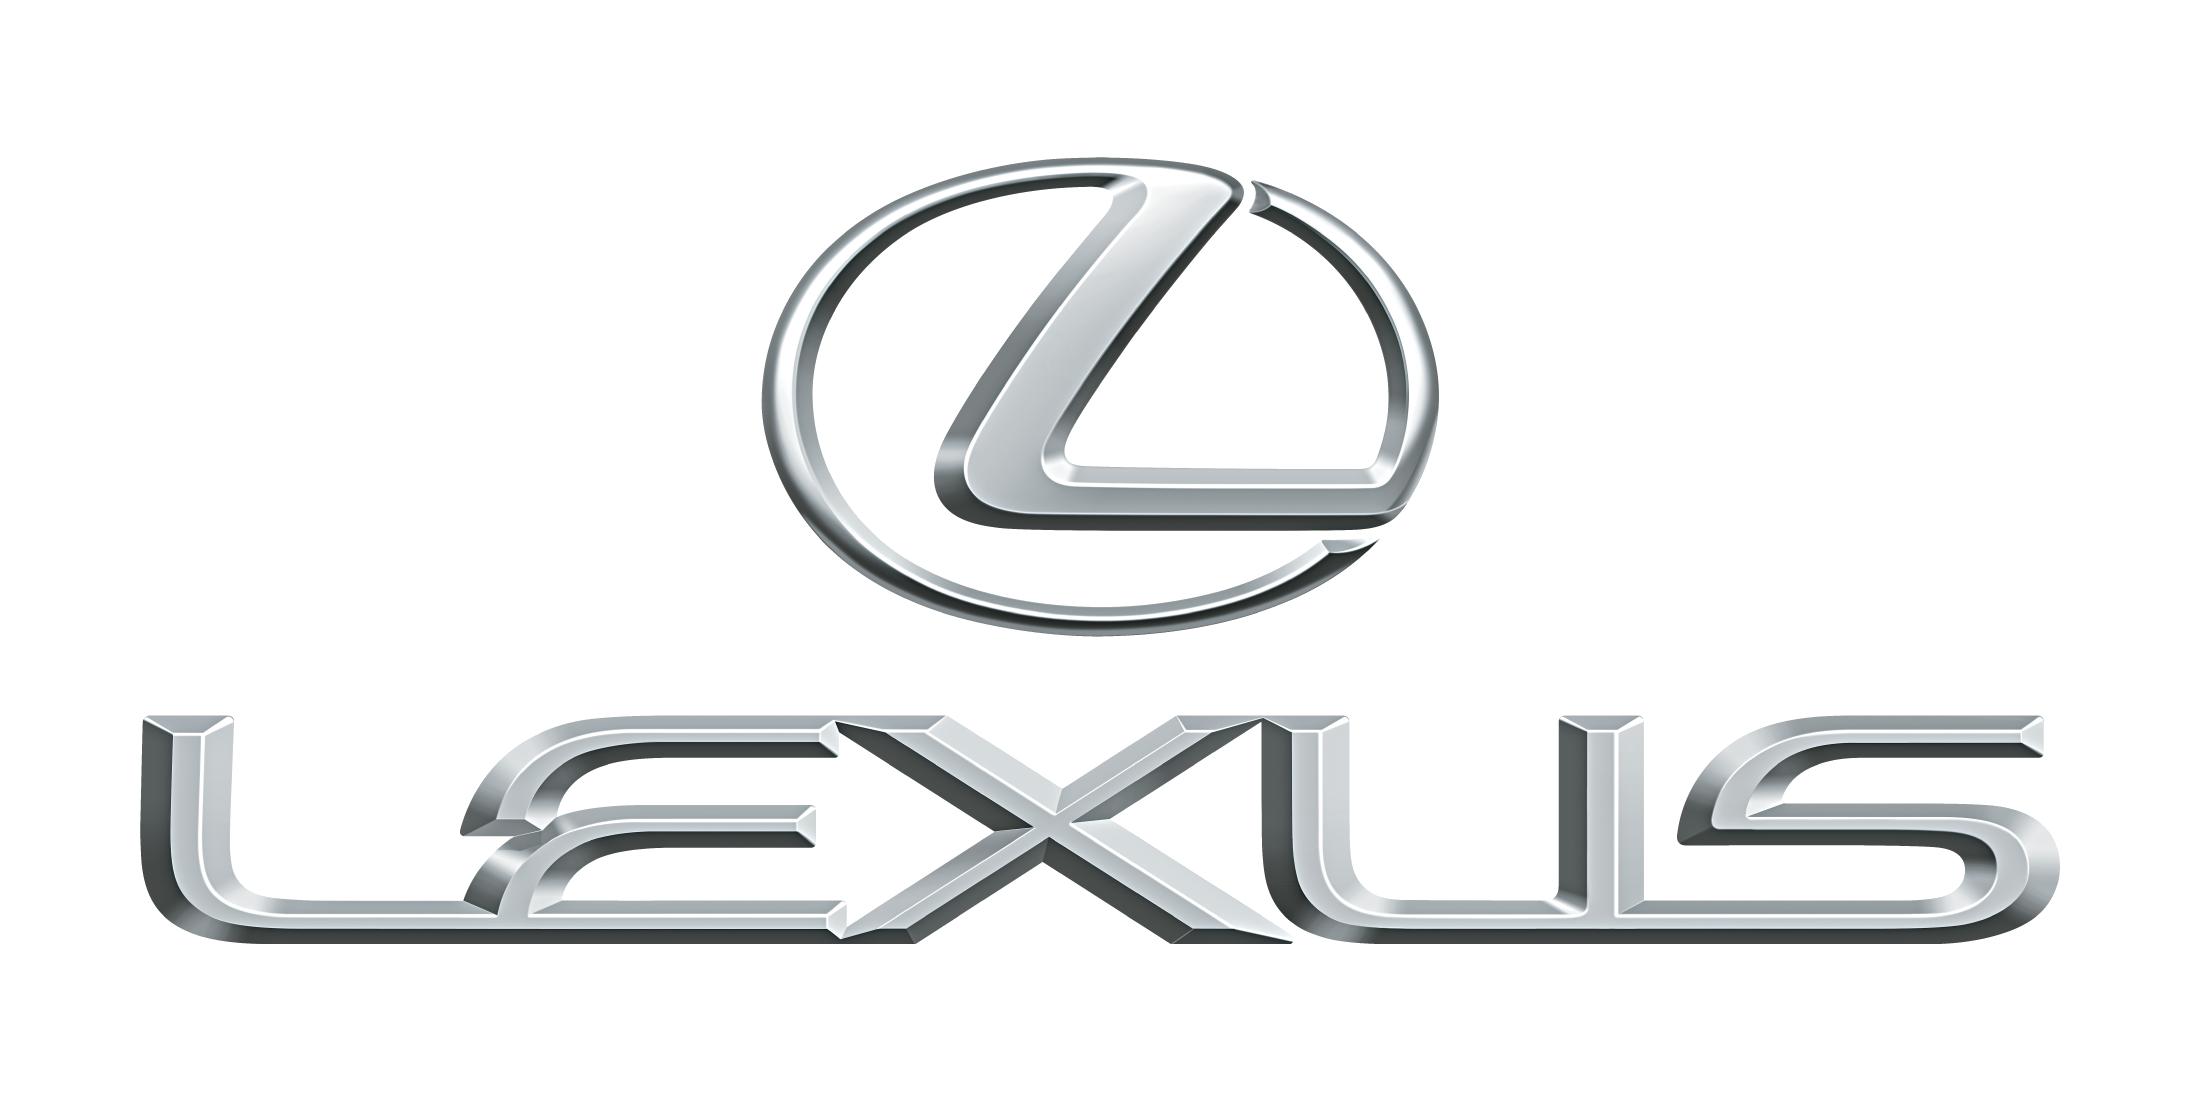 Лексус PNG фото логотип, Lexus car logo PNG